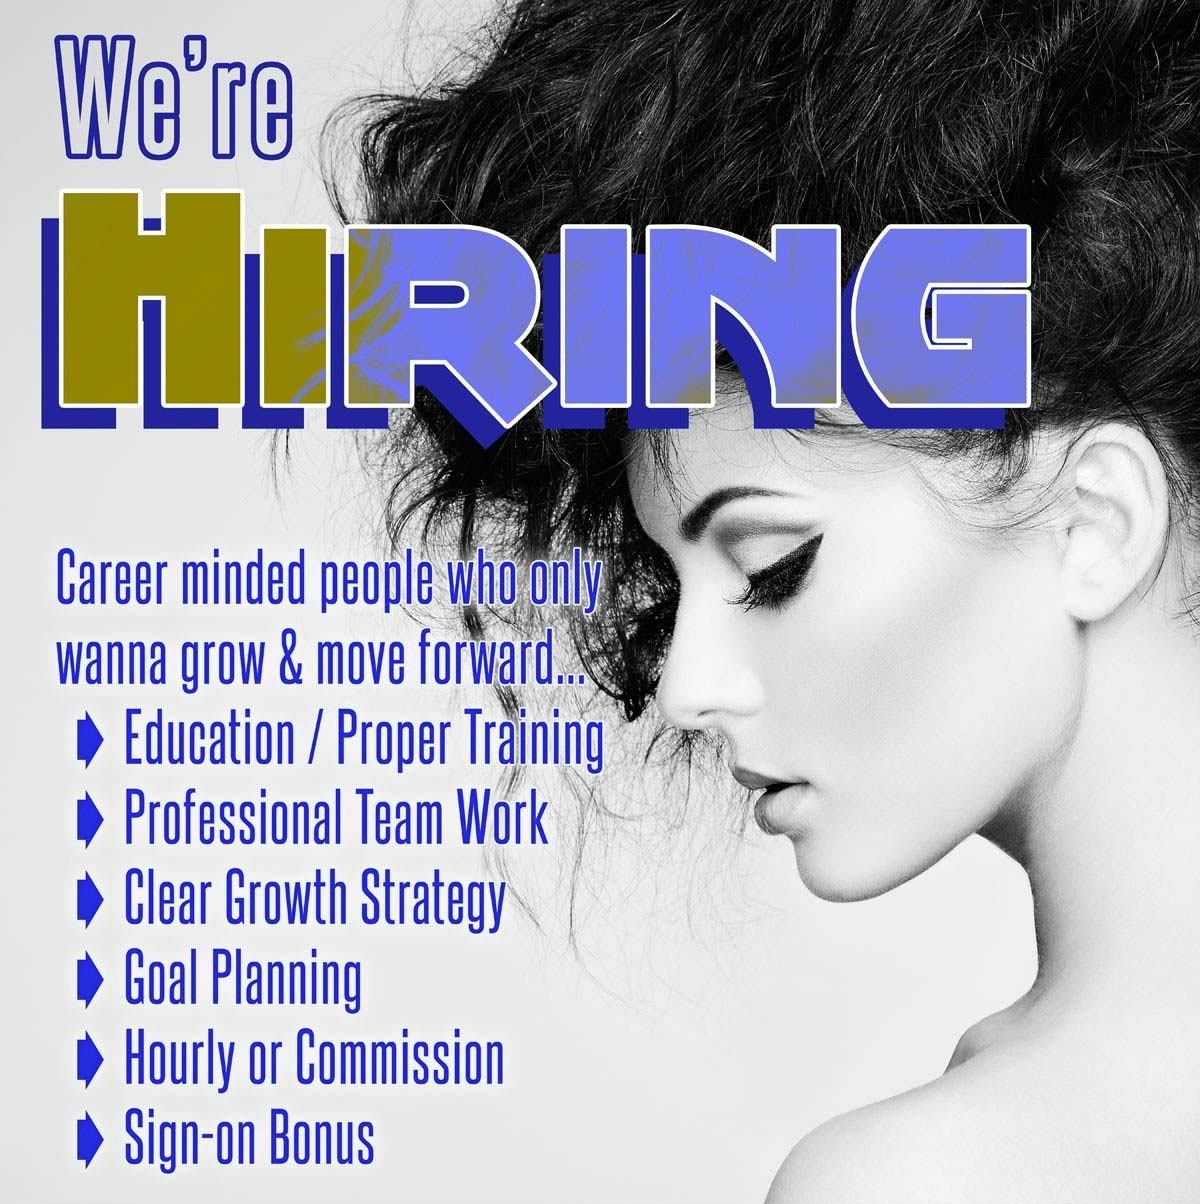 Blu is hiring stylists